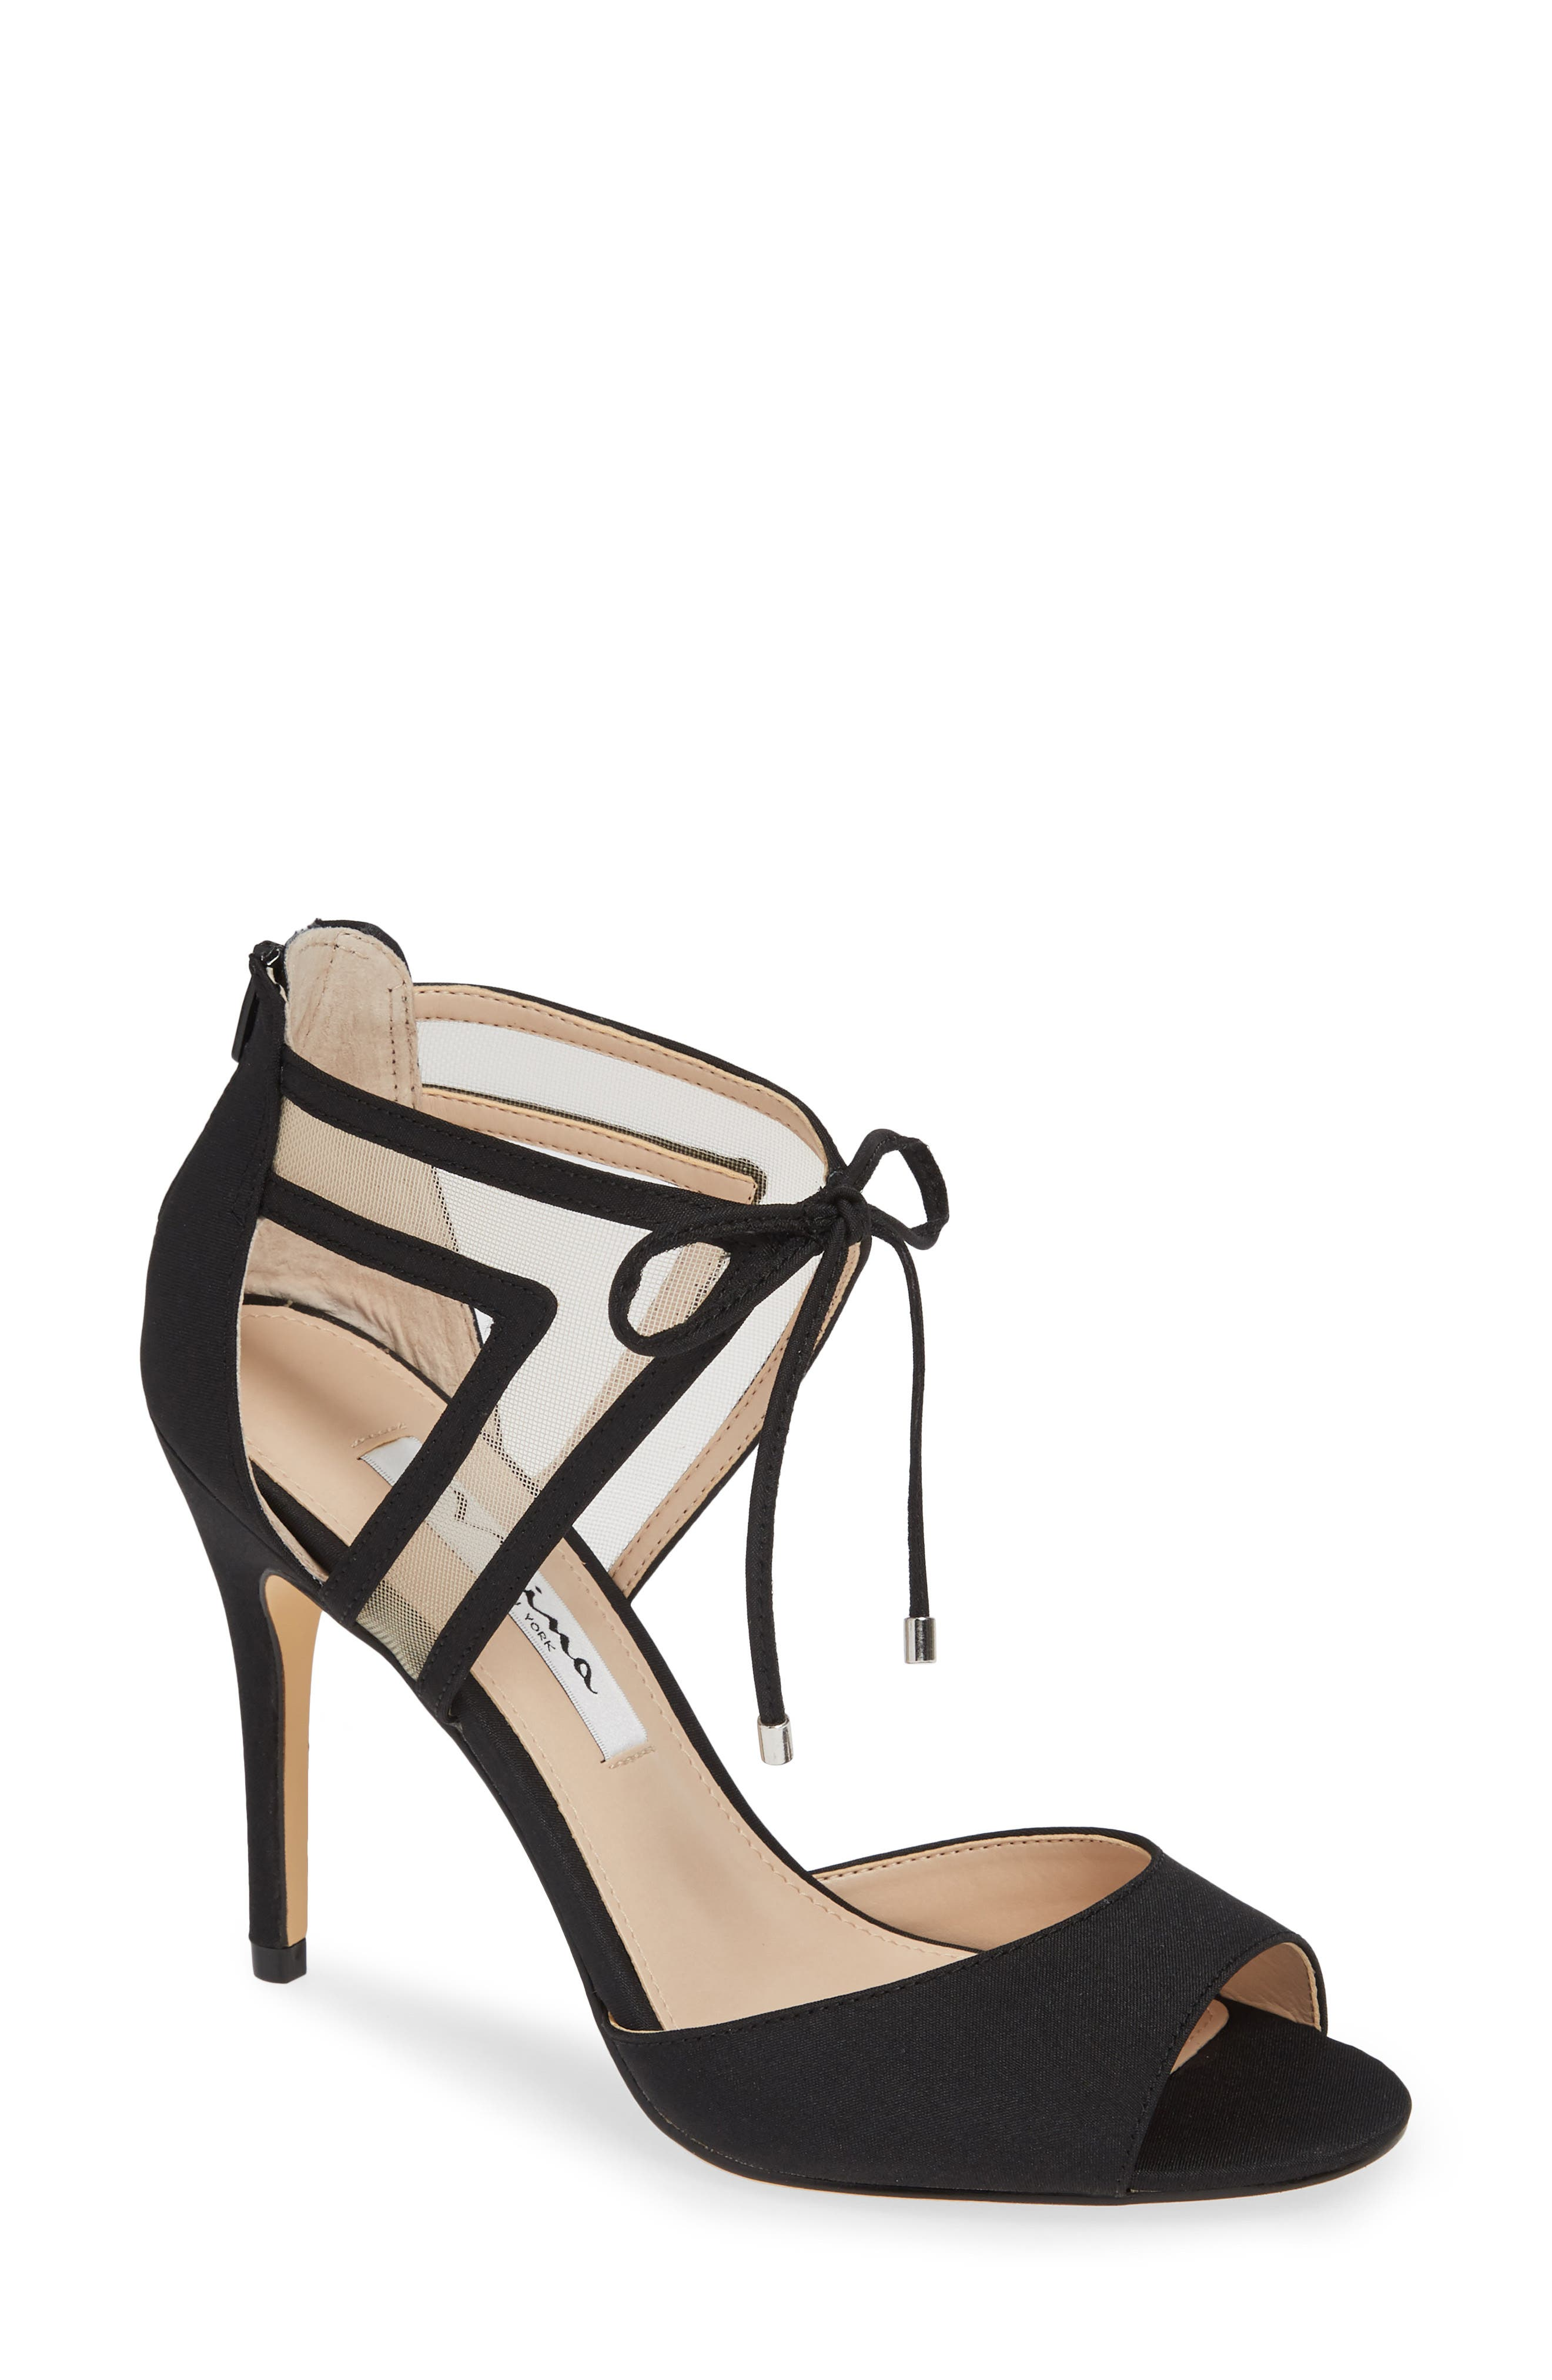 NINA Caleya Ankle Tie Sandal, Main, color, BLACK CHAMPAGNE